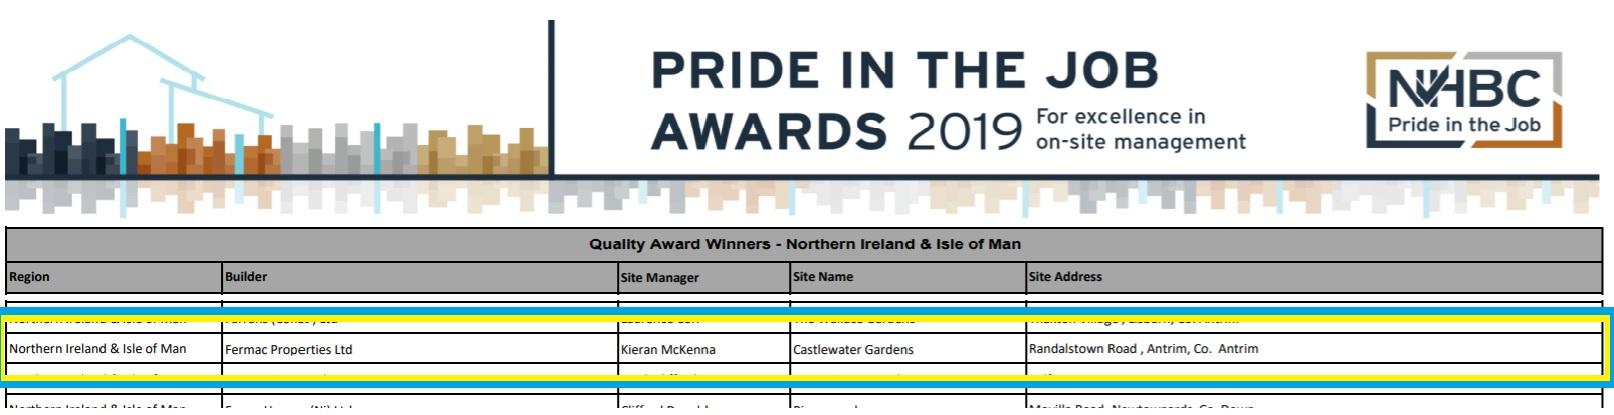 NHBC – Pride in the Job Winners!